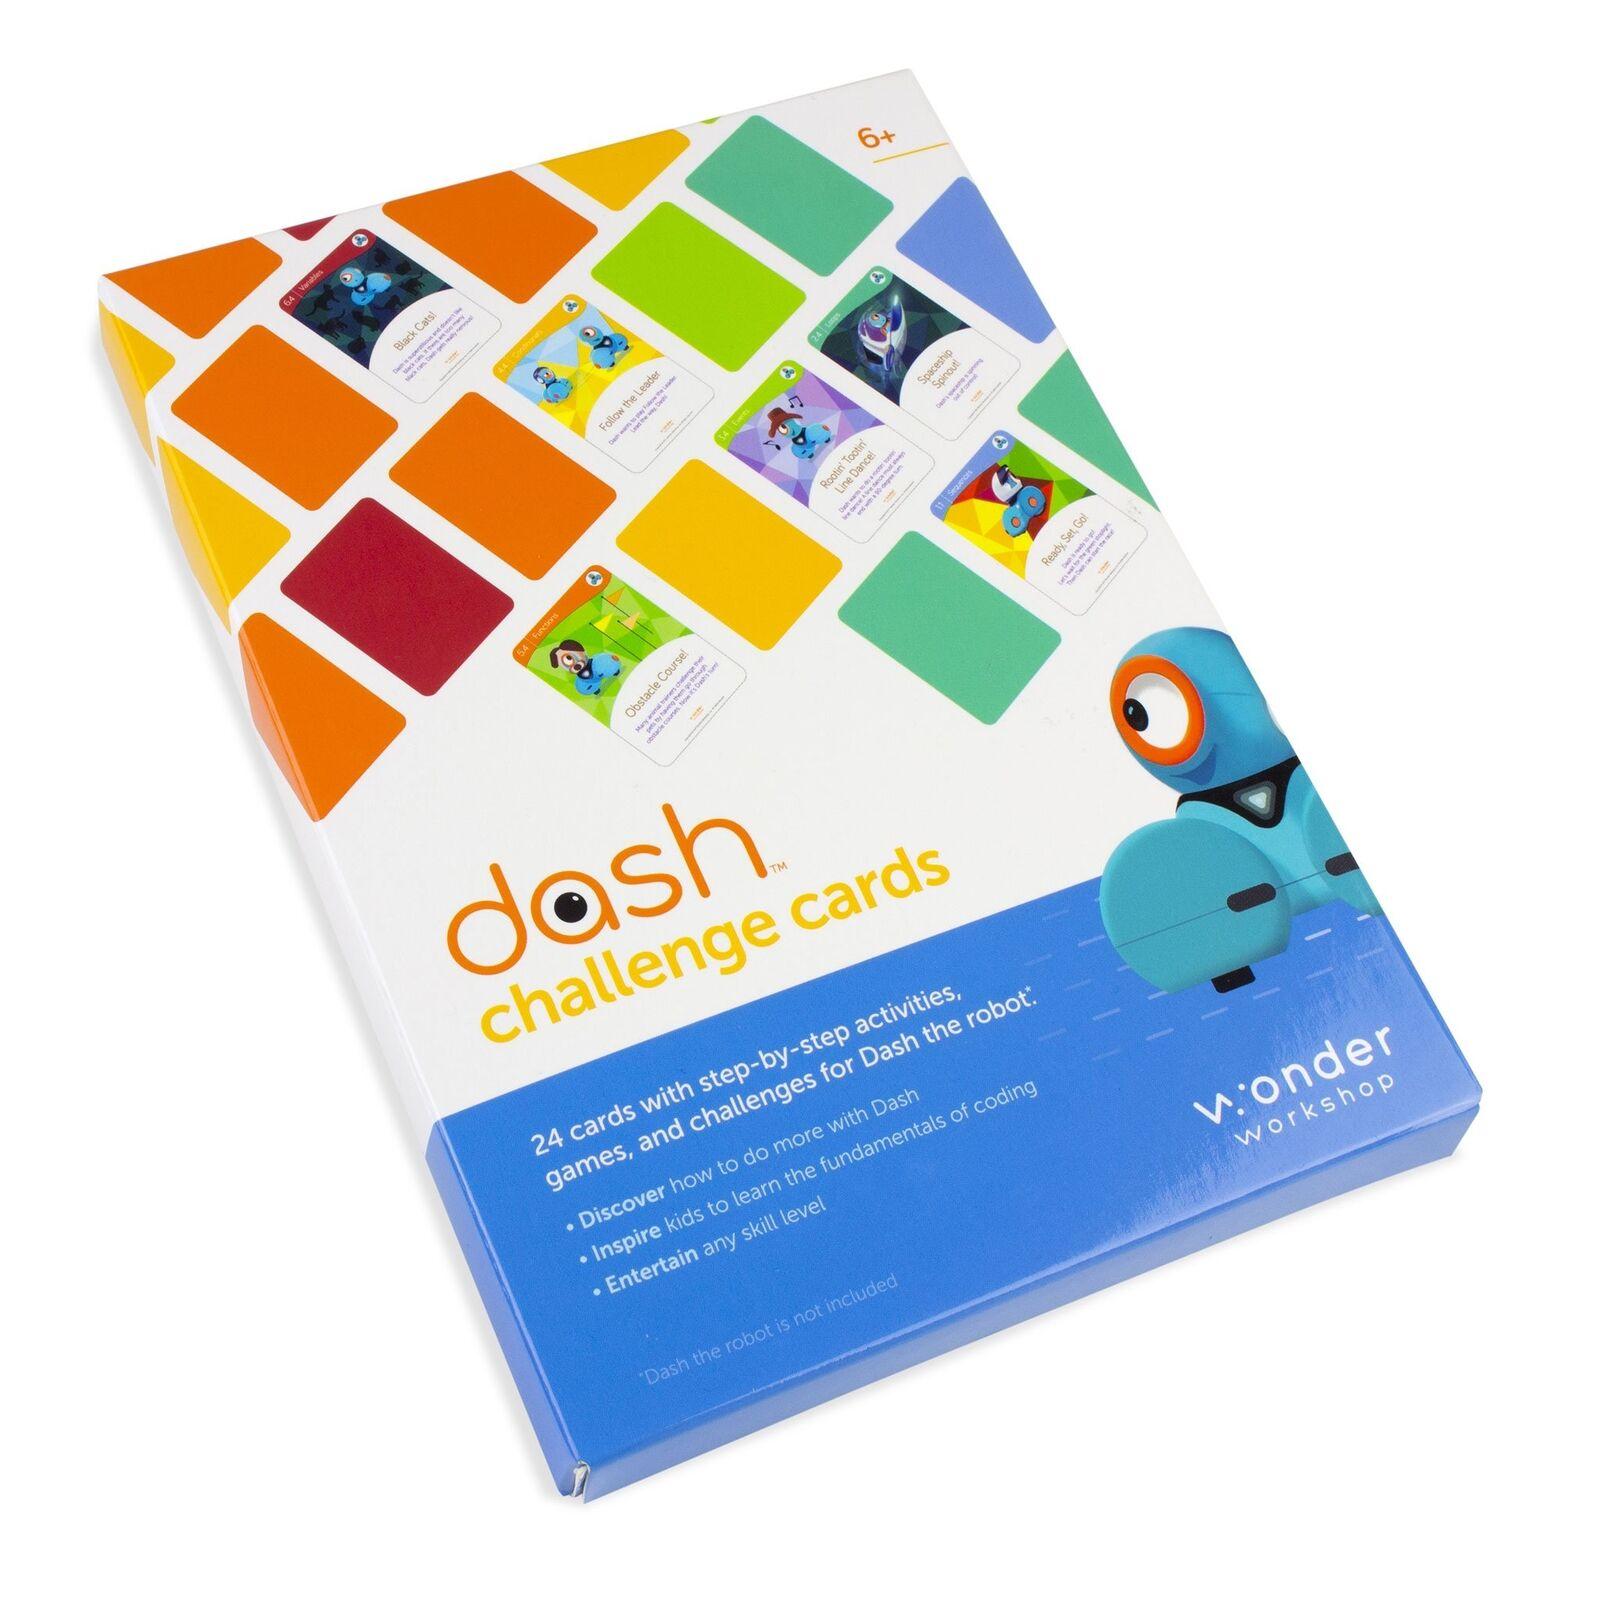 Details about Wonder Workshop Challenge Cards Accessory for Dash STEM  Coding Robots